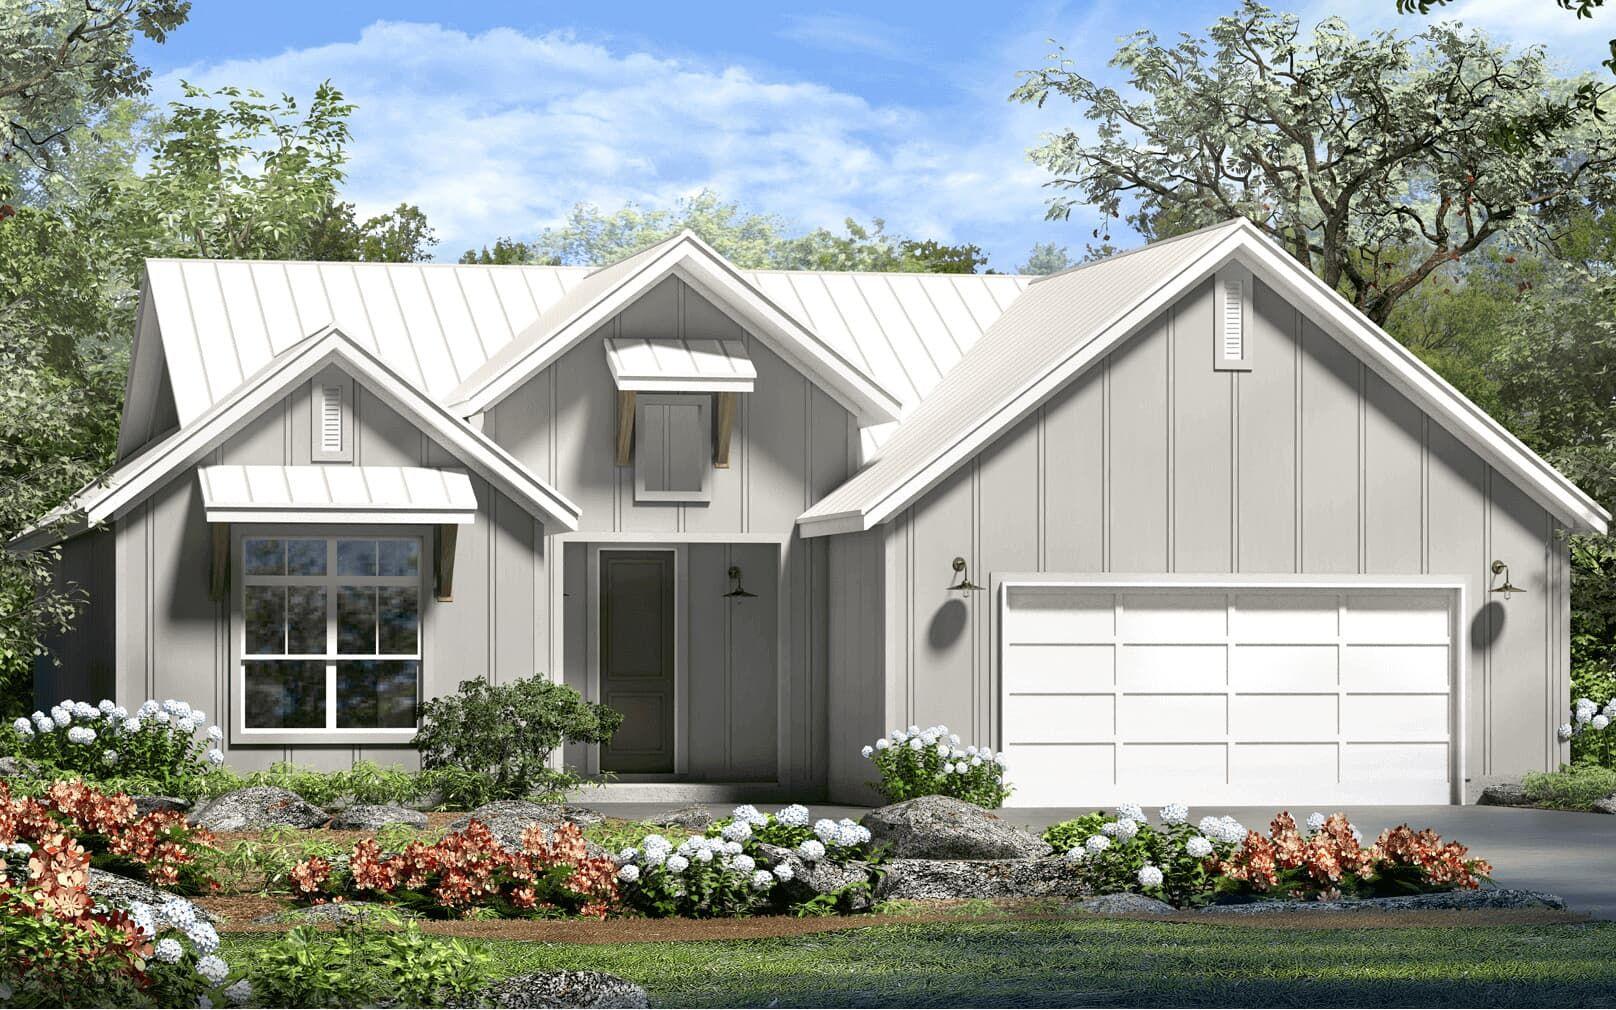 Exterior:floor plan wheaton modern farmhouse kissing tree san marcos texas